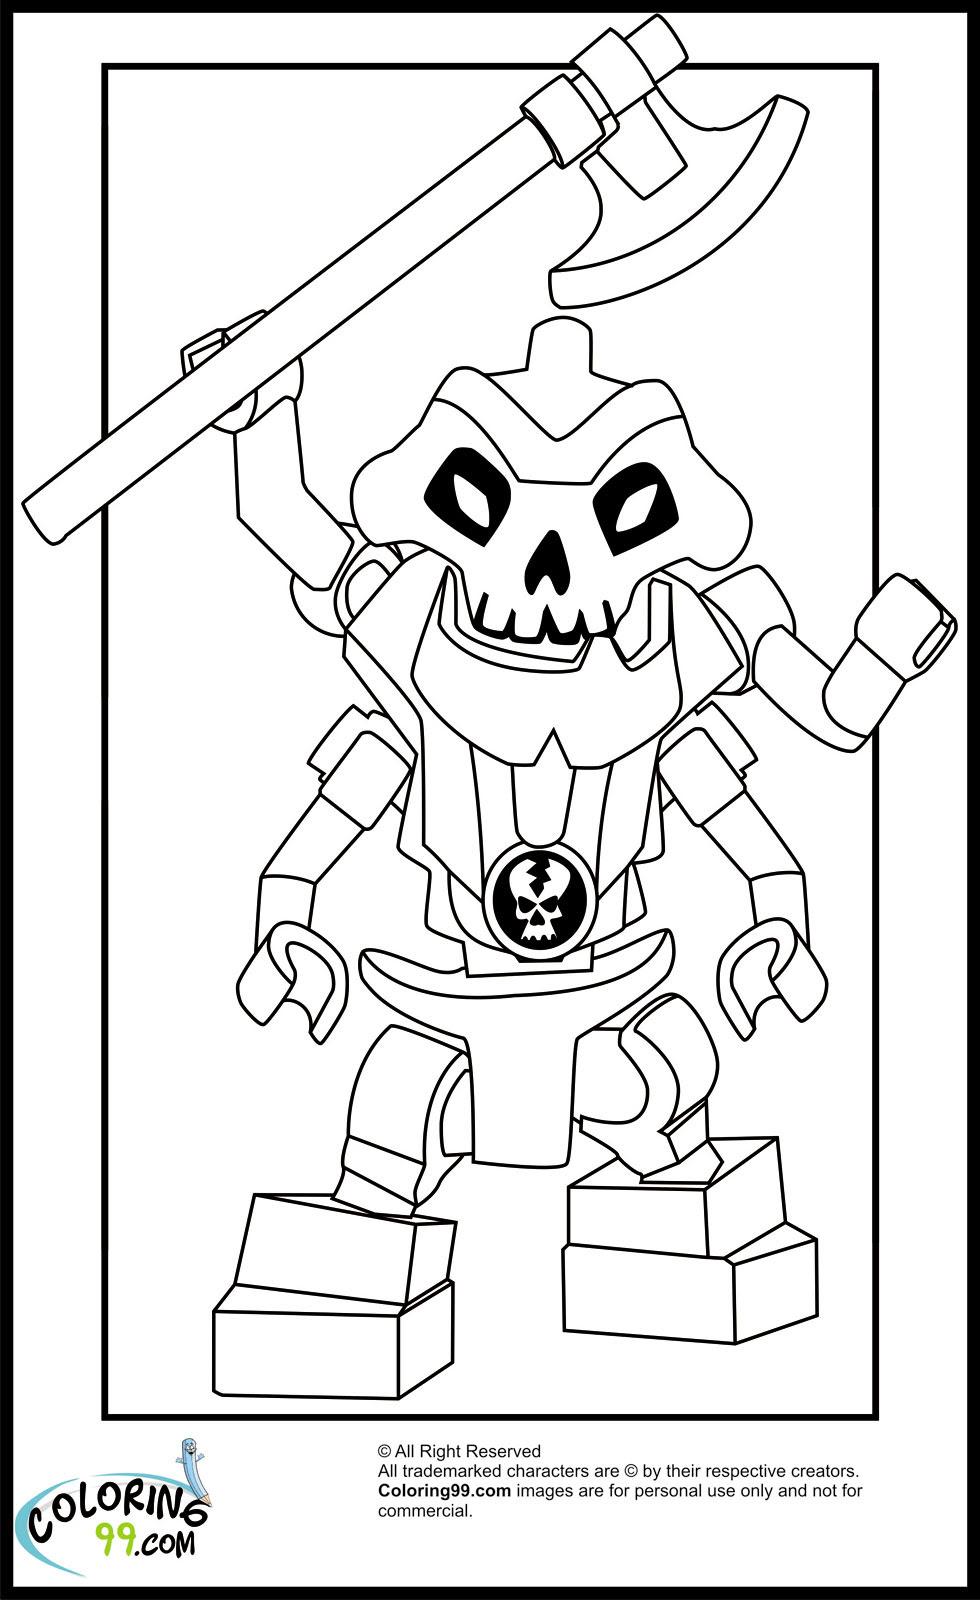 Coloriage ninjago gratuit dessin a imprimer 279